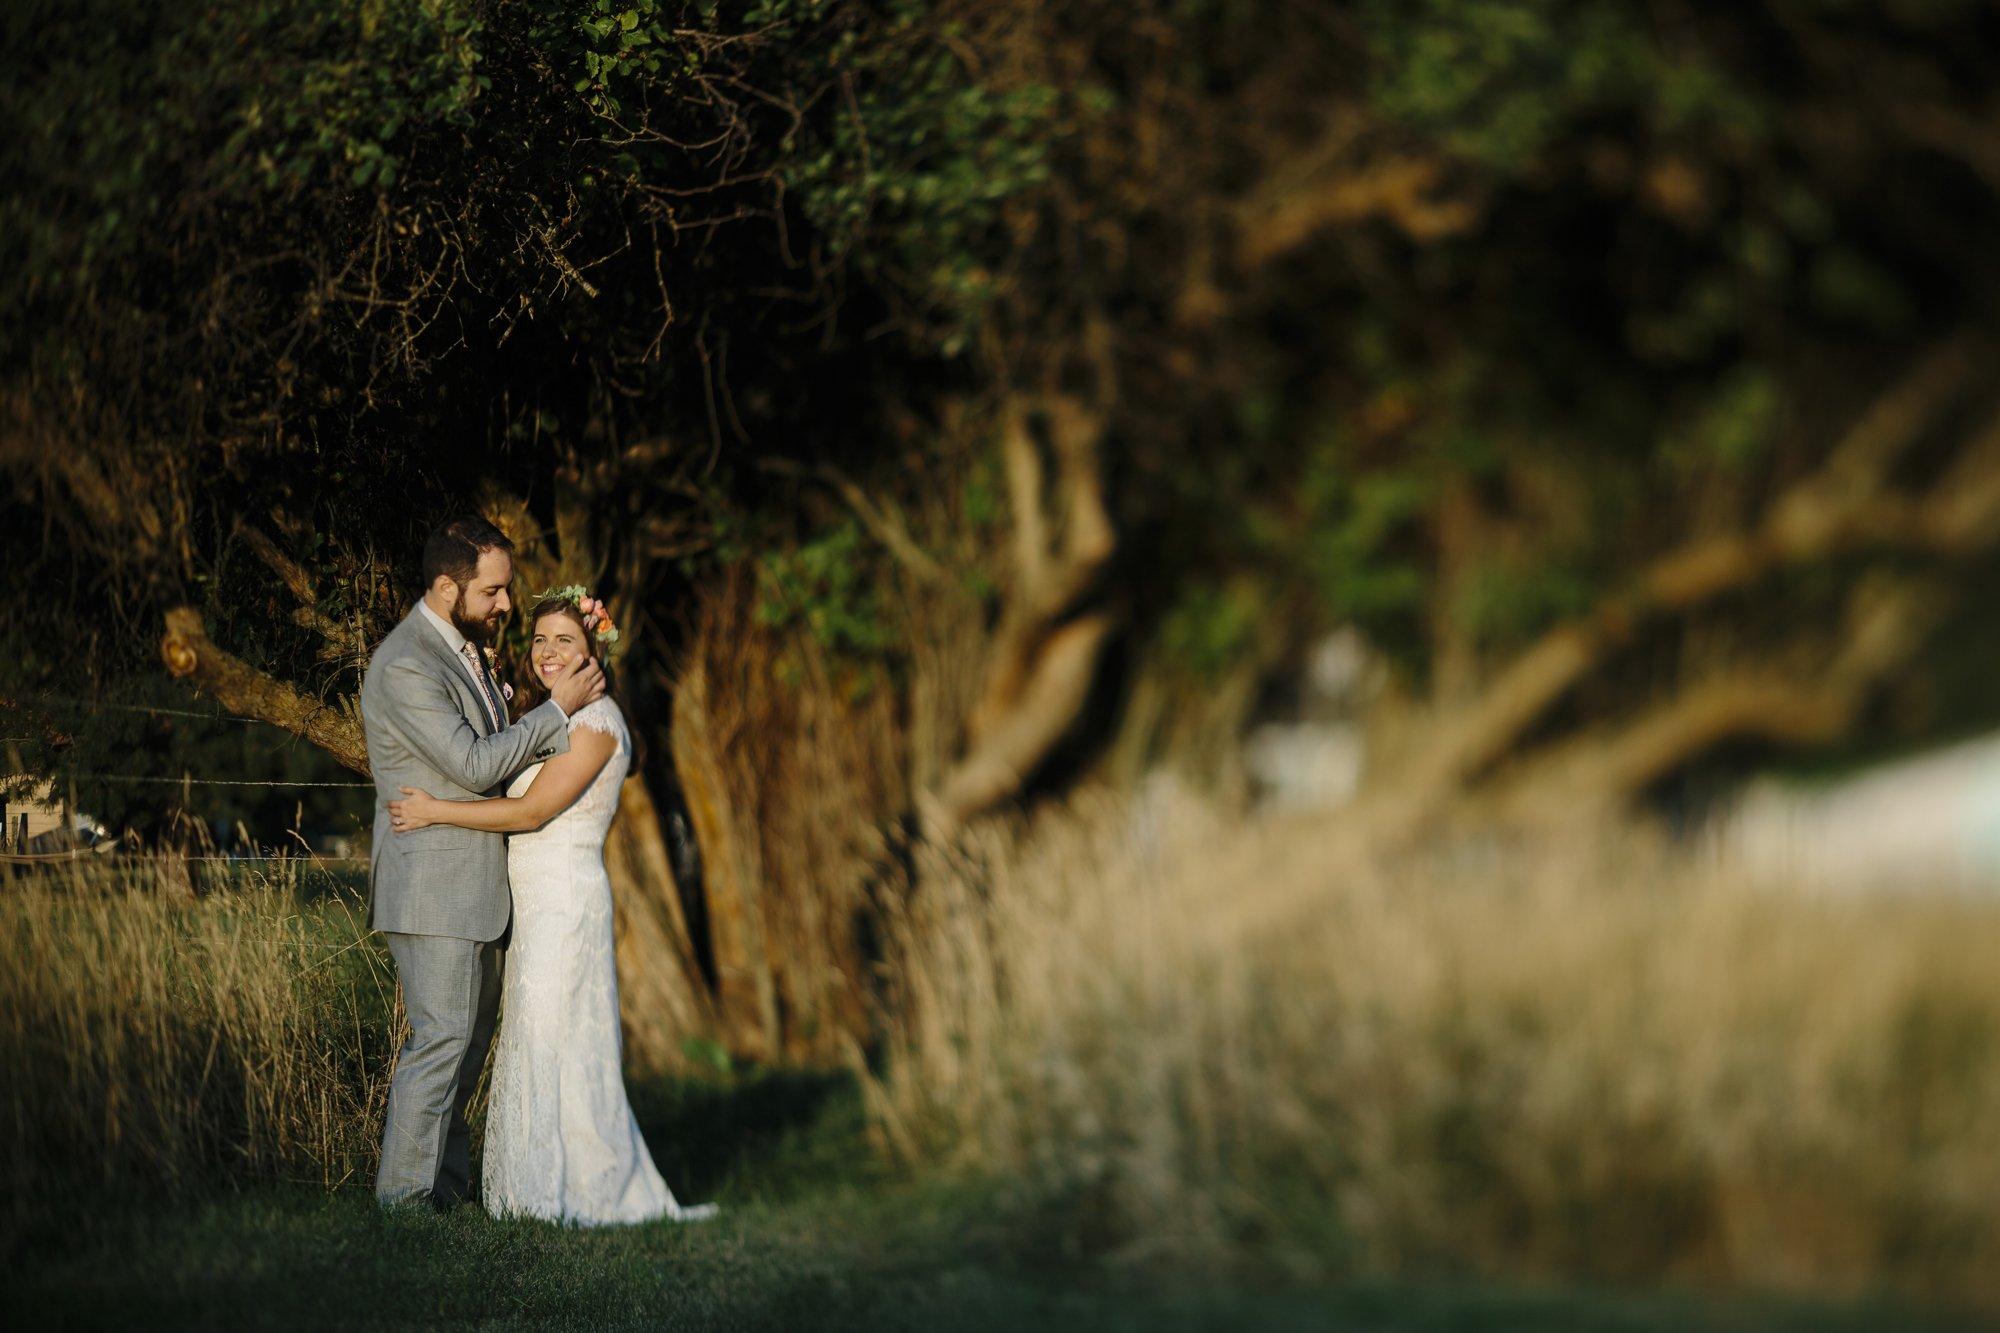 Coeur d'Alene Resort Wedding Photographer // Emily Wenzel Photography